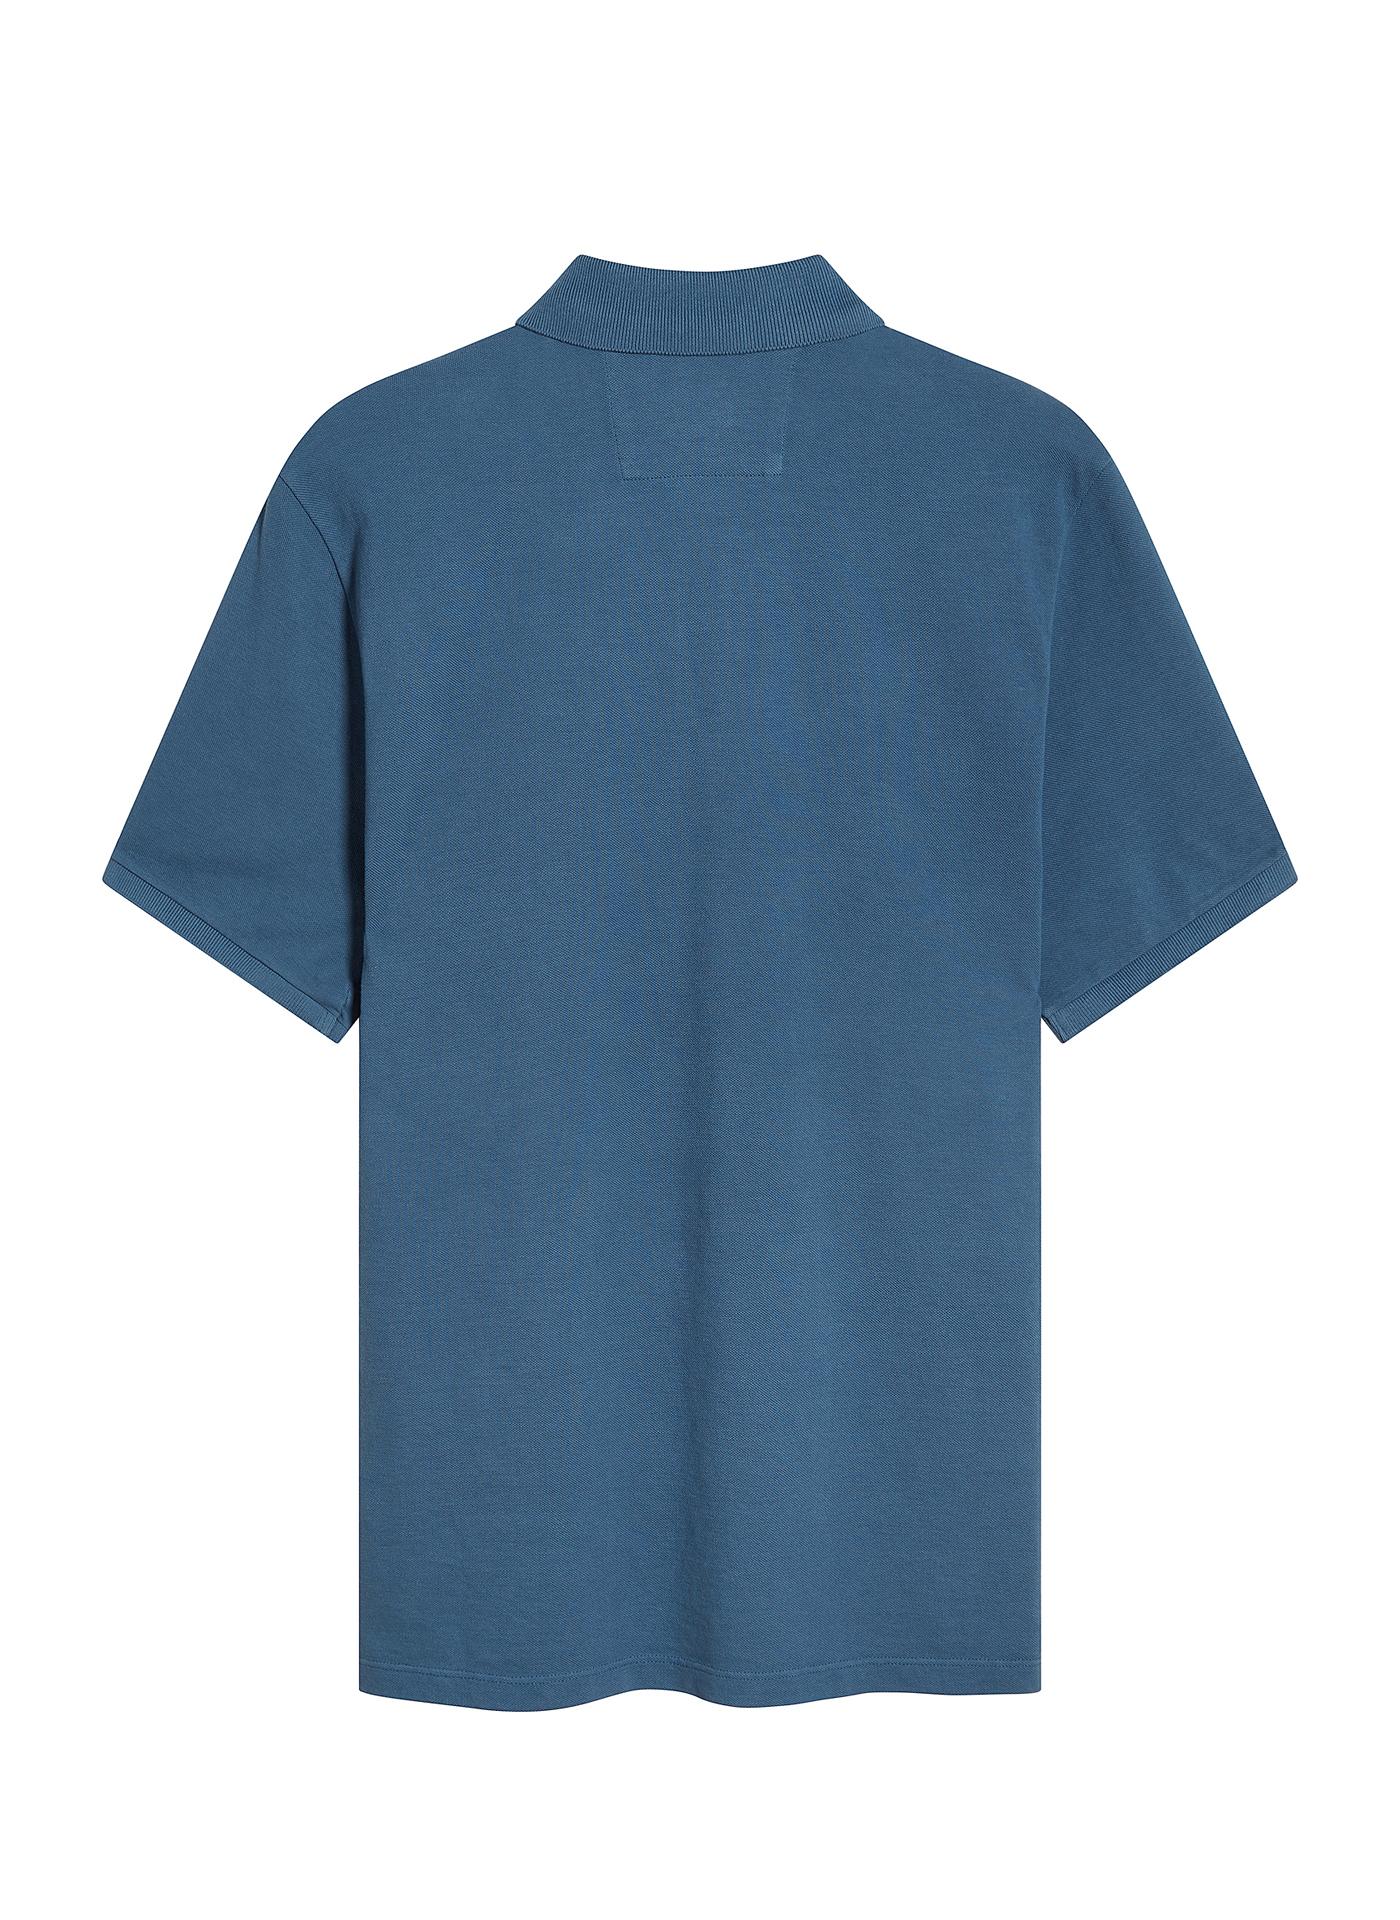 back shot of the light navy C.P. polo shirt on white background